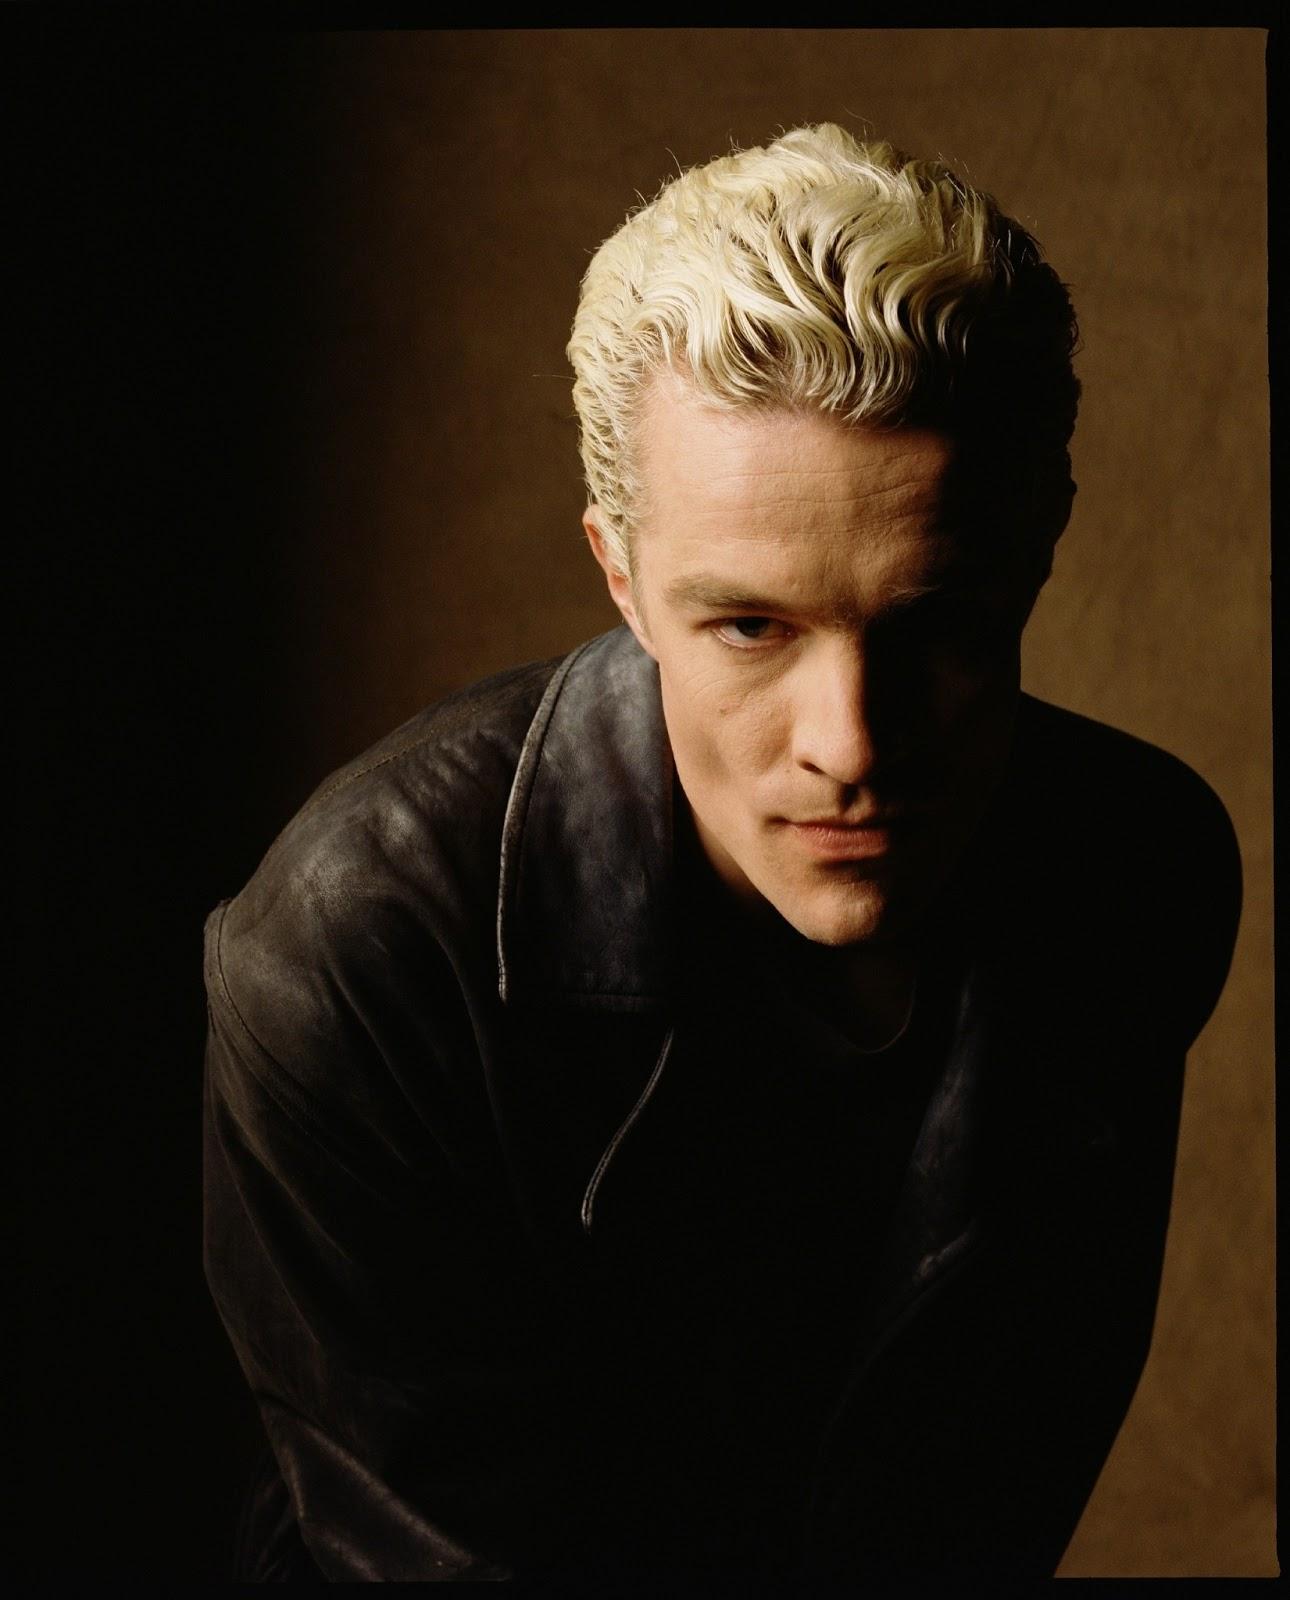 Spike (Buffy the Vampire Slayer) - Wikipedia